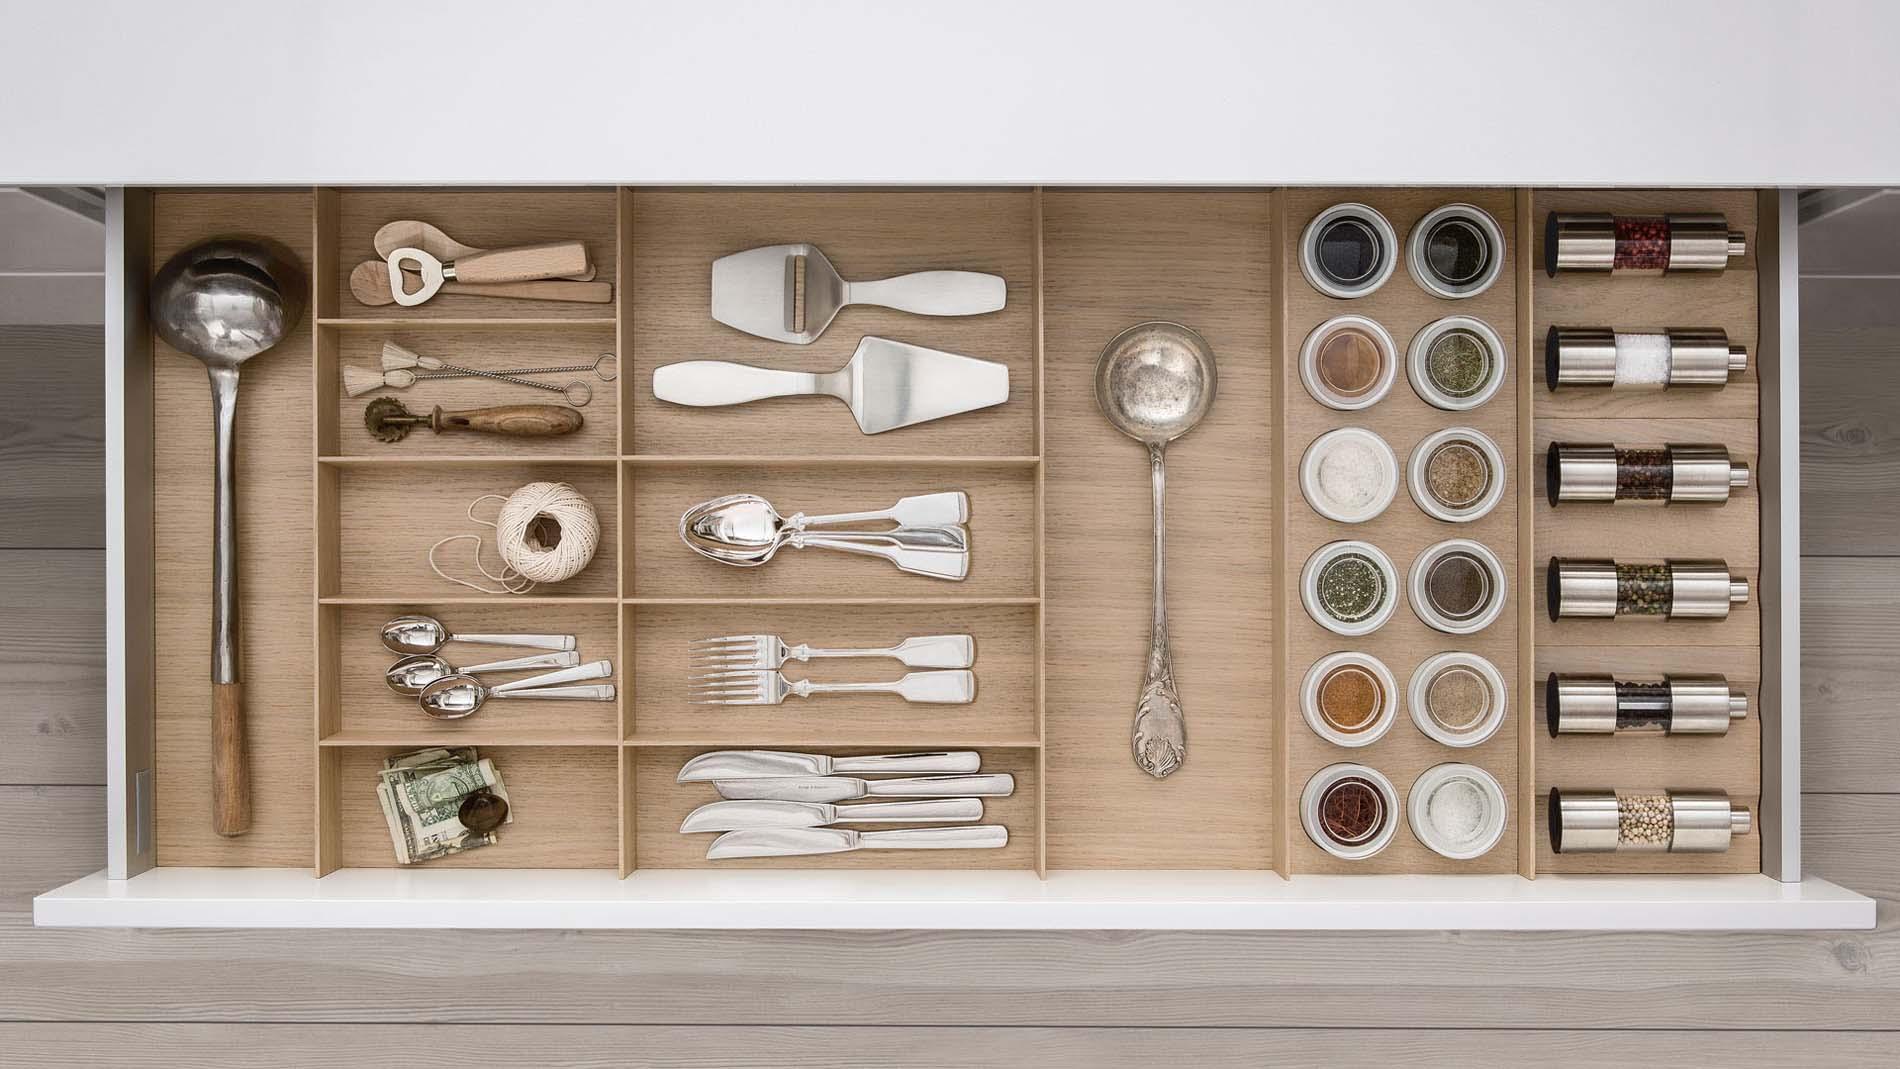 SieMatic INSIDE lade indeling met kruideninrichting en licht eiken hout, Keuken accessoires ASWA Keukens